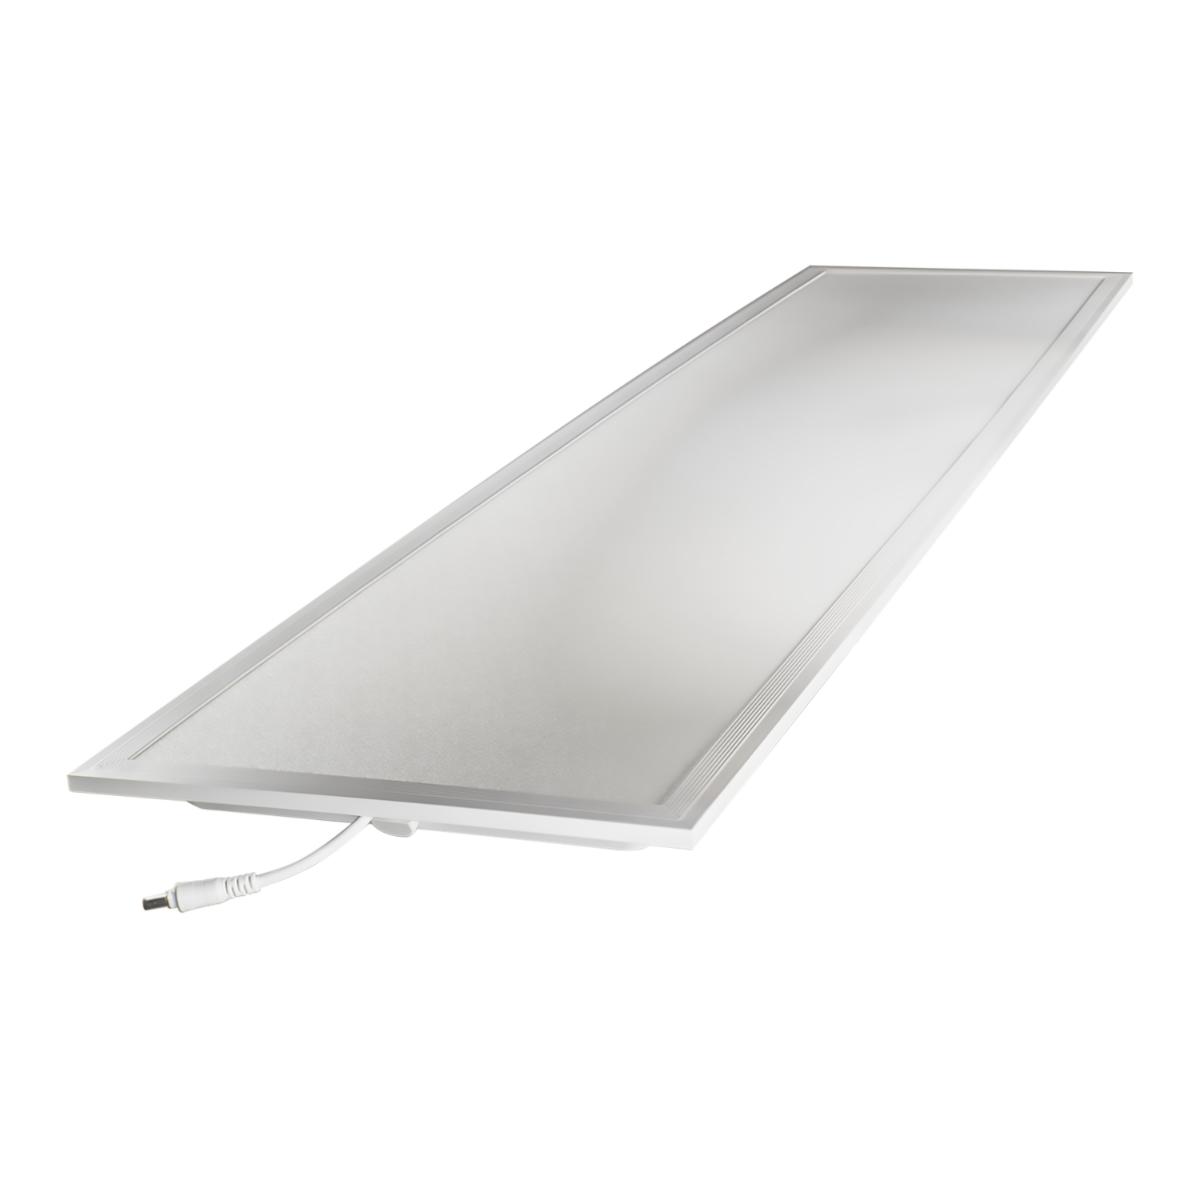 Noxion Panel LED Econox 32W Xitanium DALI 30x120cm 6500K 4400lm UGR <22 | Dali Regulable - Luz de Día - Reemplazo 2x36W